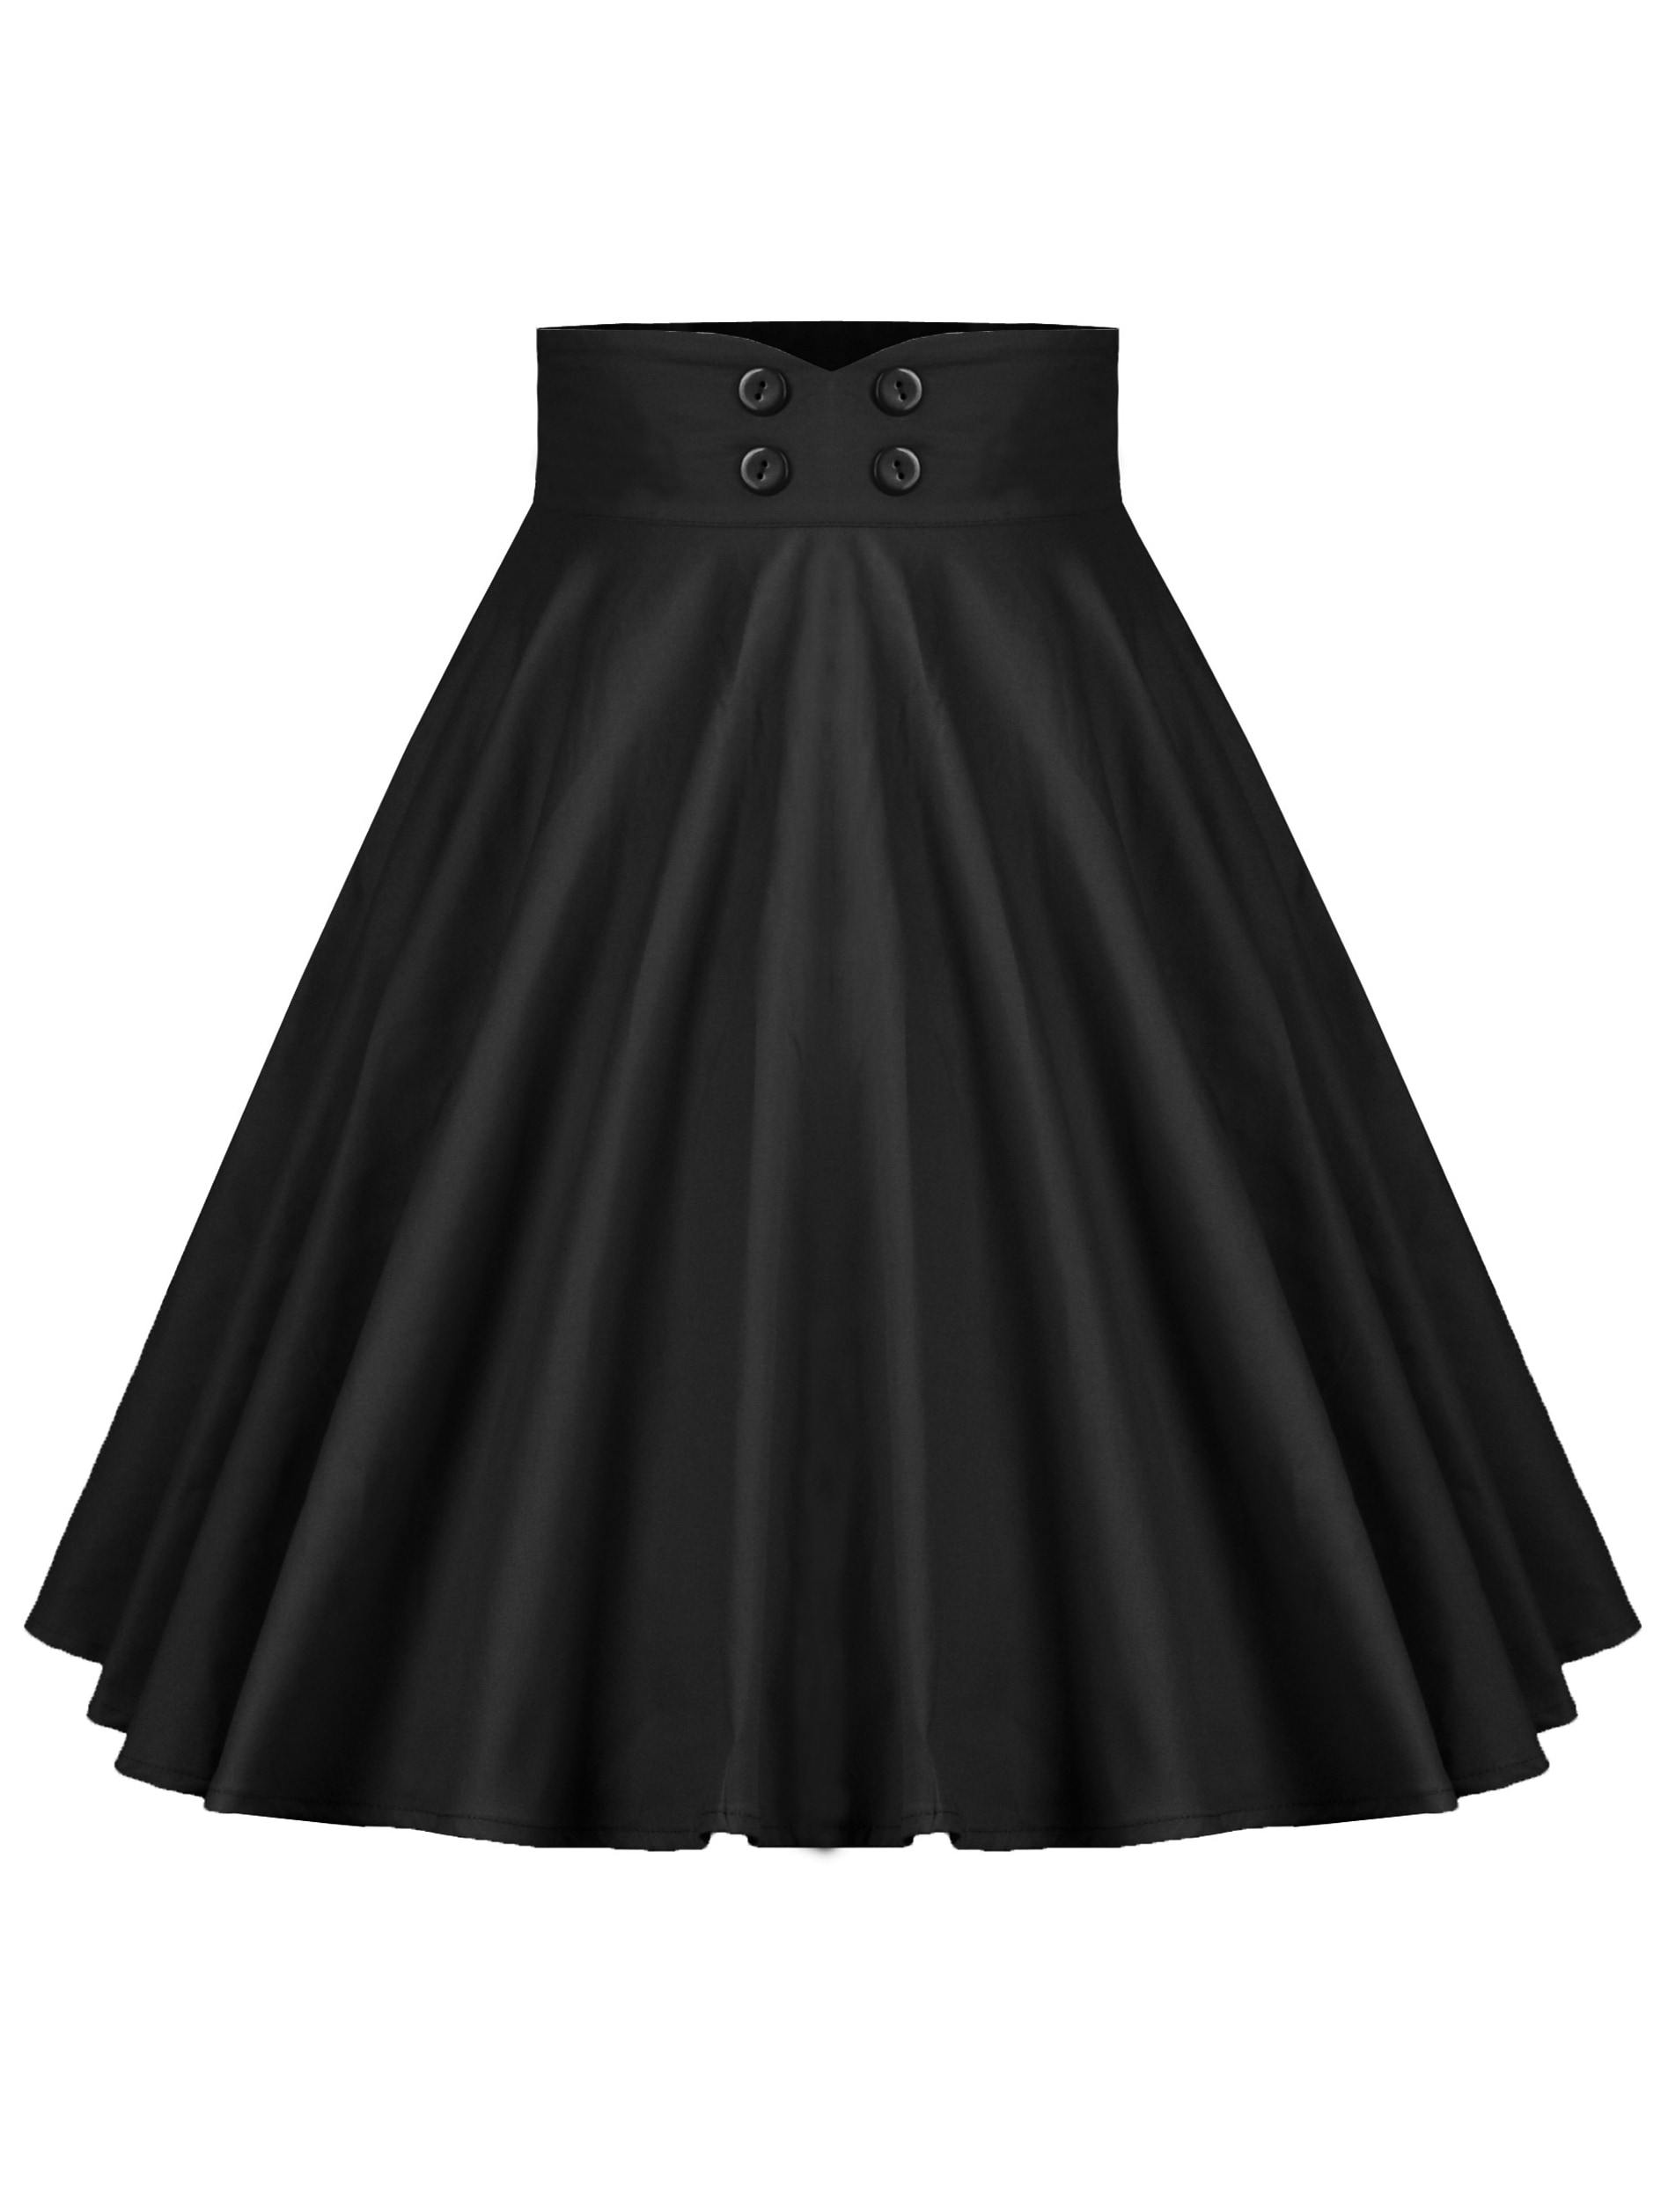 50s двубортная юбка-клёш с пуговицами на талии thumbnail